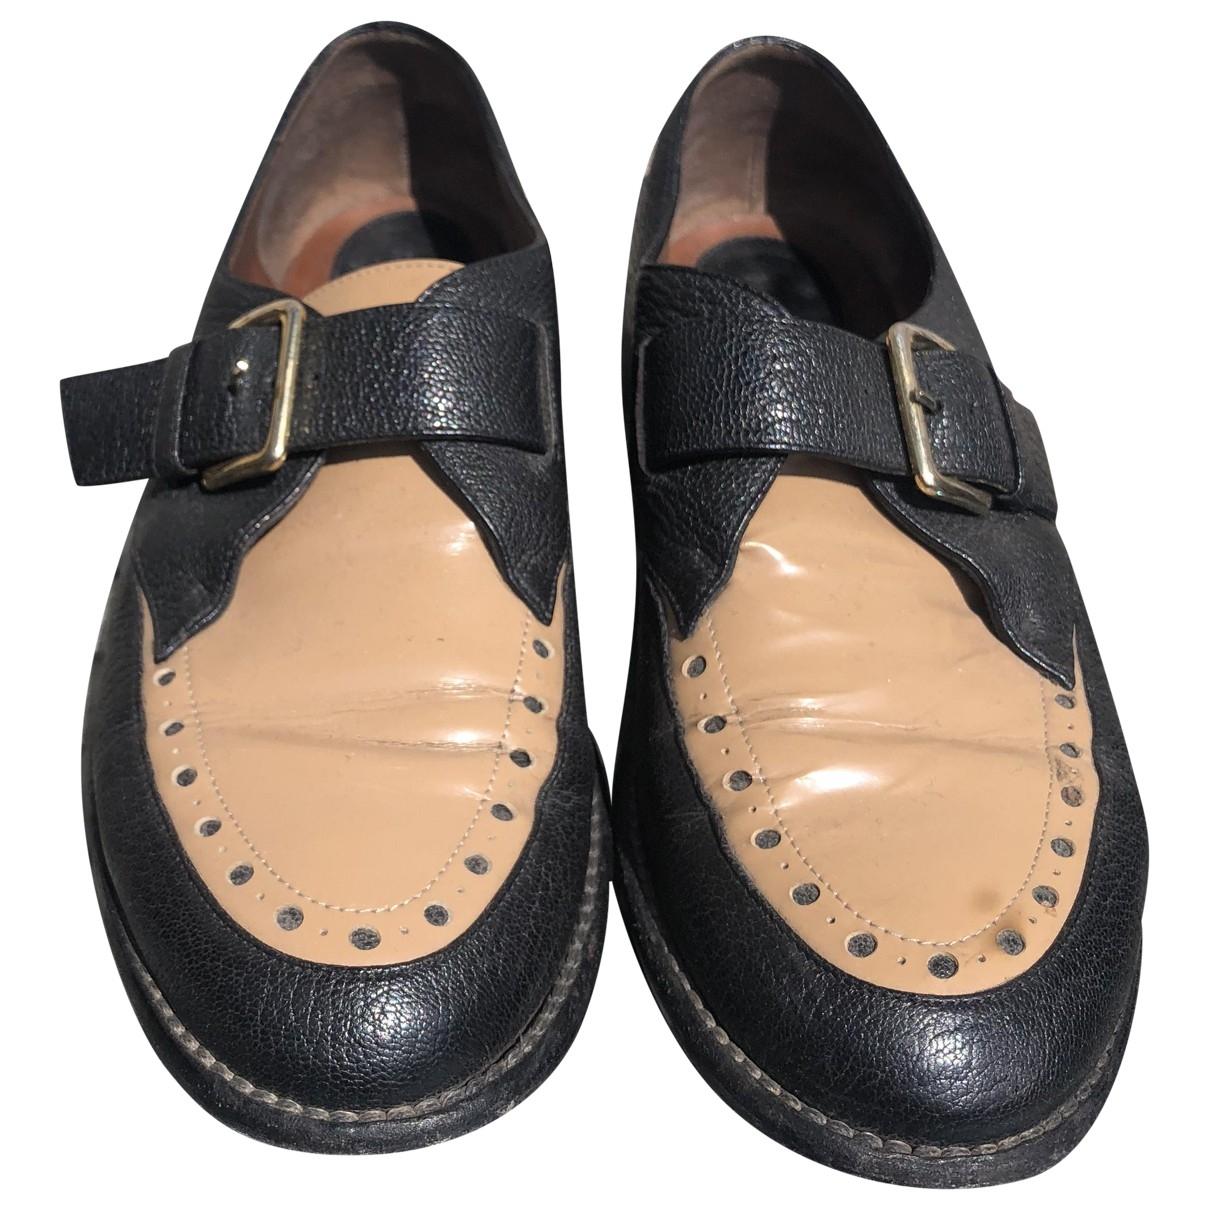 Marni \N Black Leather Lace ups for Women 36.5 EU